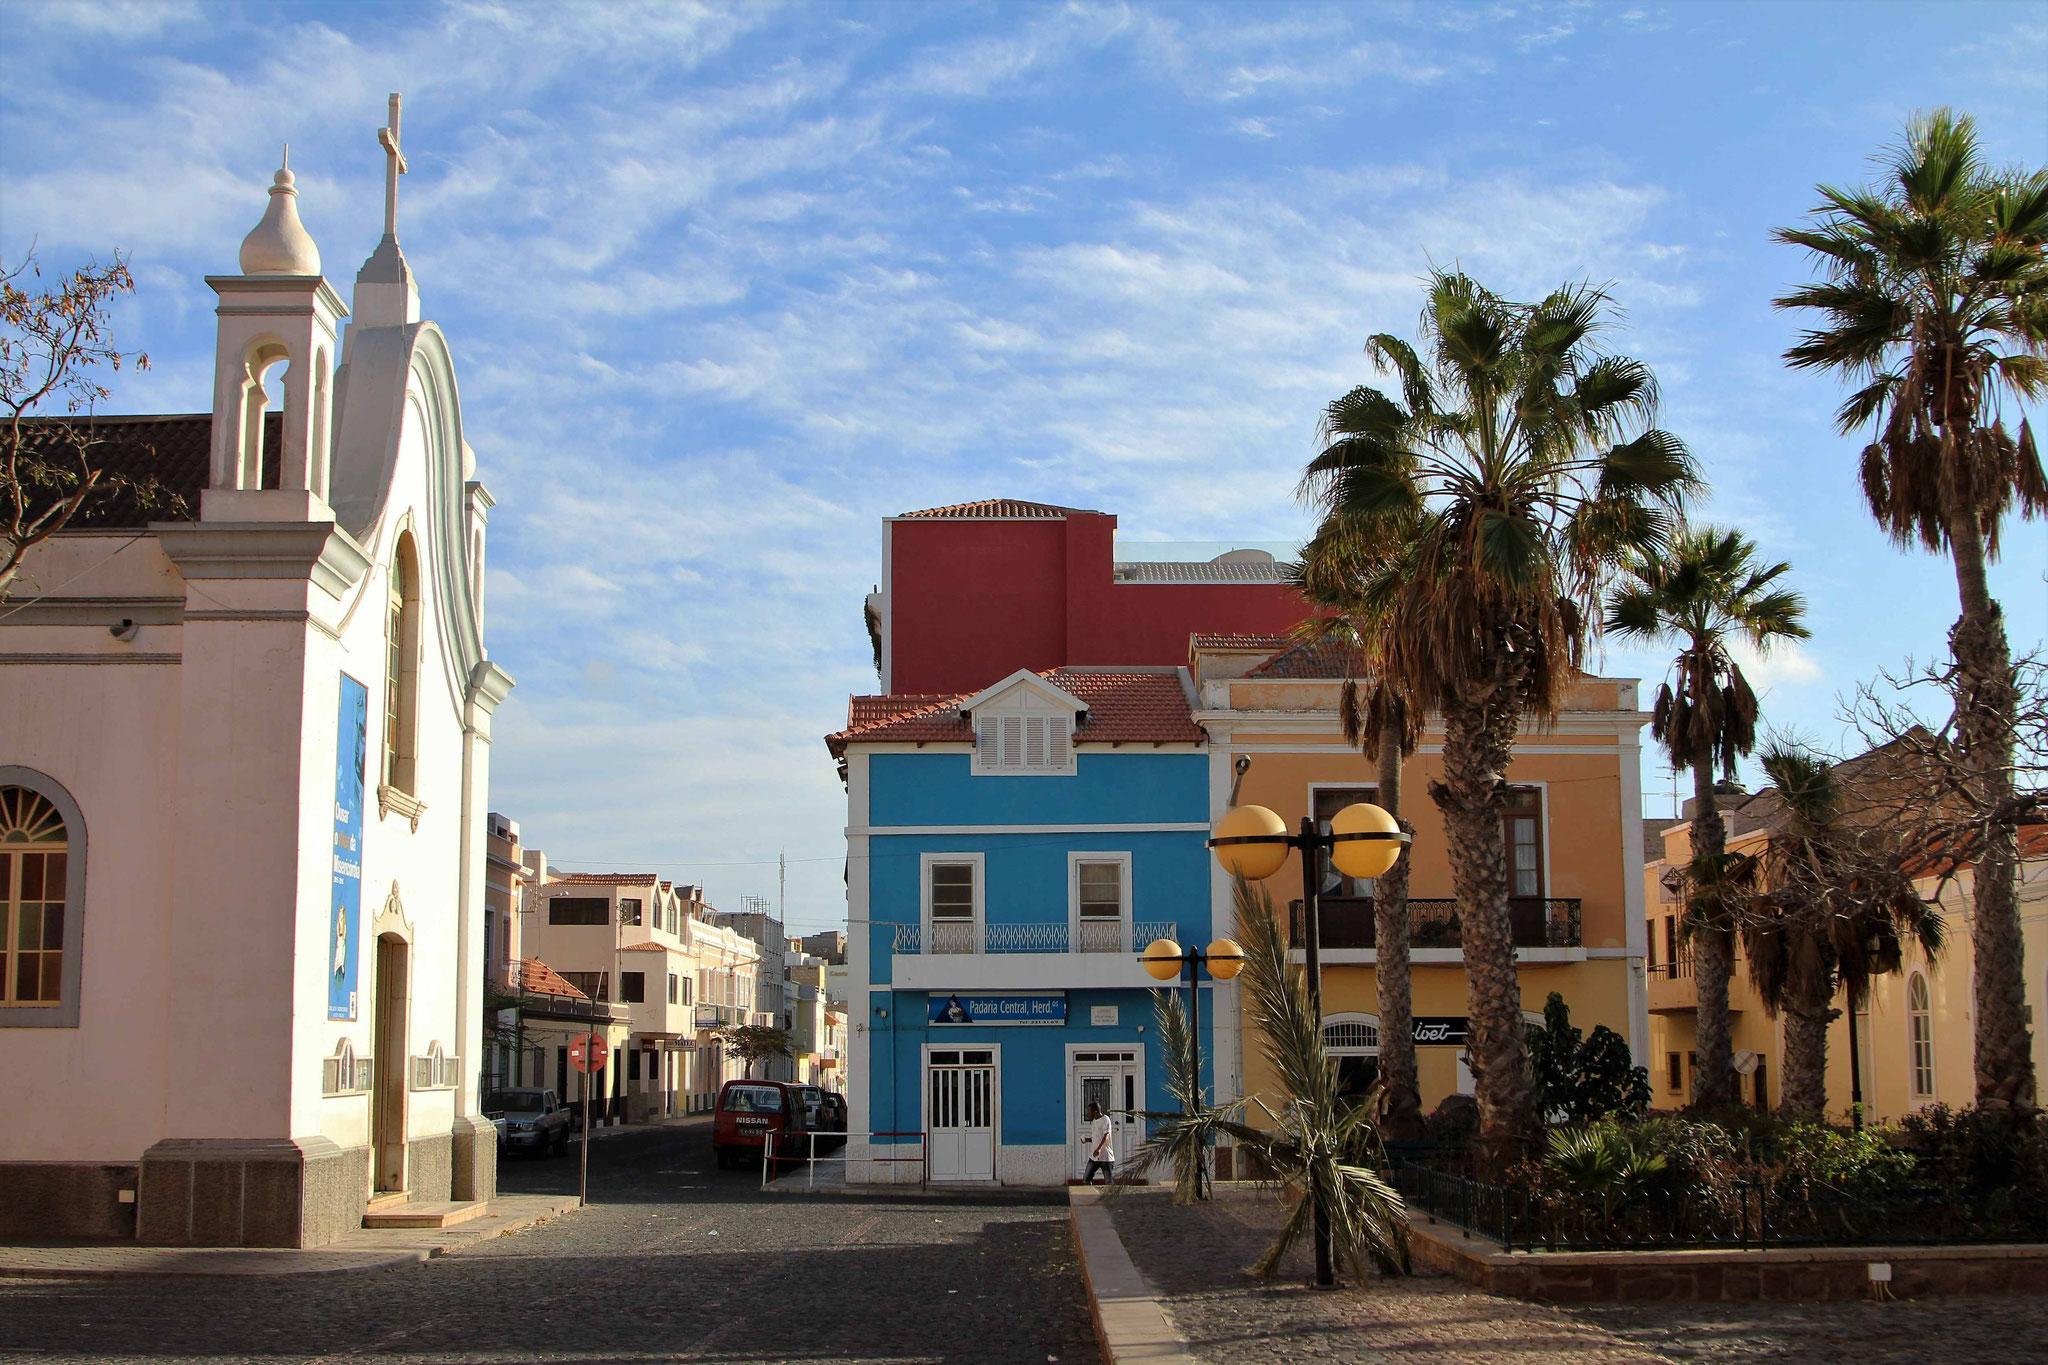 Sao Vicente - Mindelo